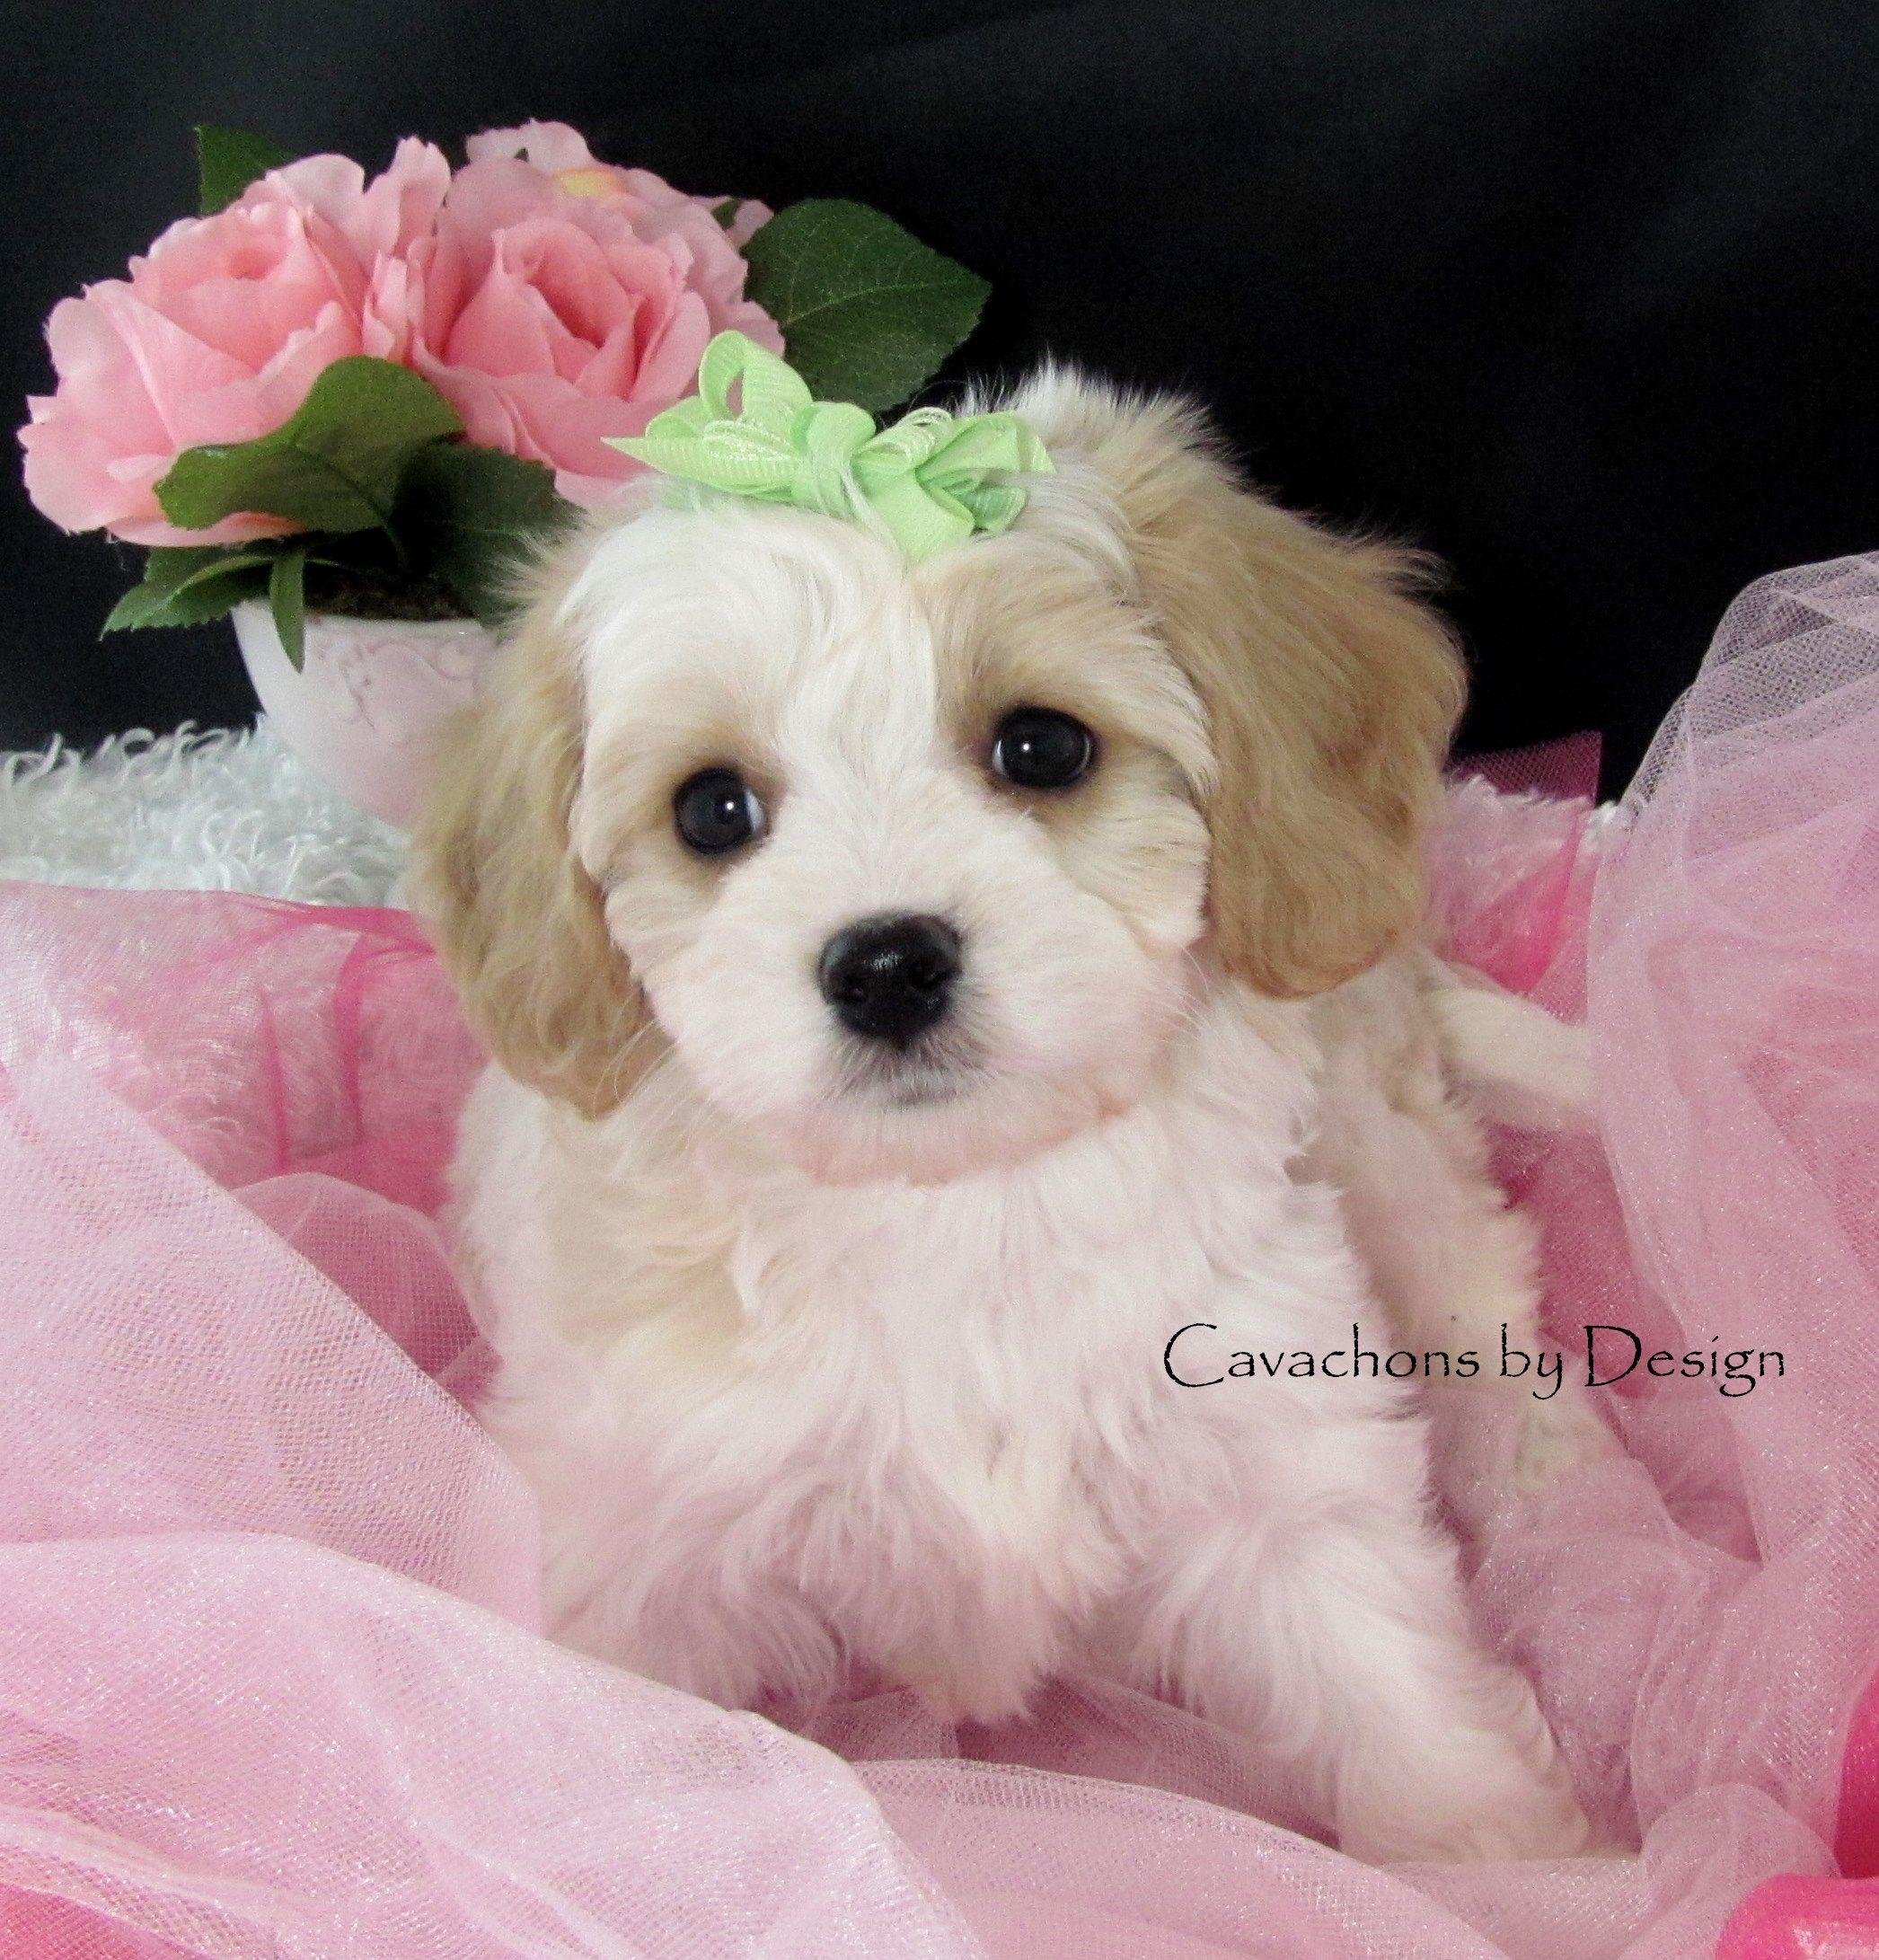 Www Cavachonsbydesign Com Cavachon Puppies For Sale Cavachon Cavachons Cavachon Dog Cavachon Pups Cavachon Pup Cav Cavachon Puppies Cavachon Cavachon Dog